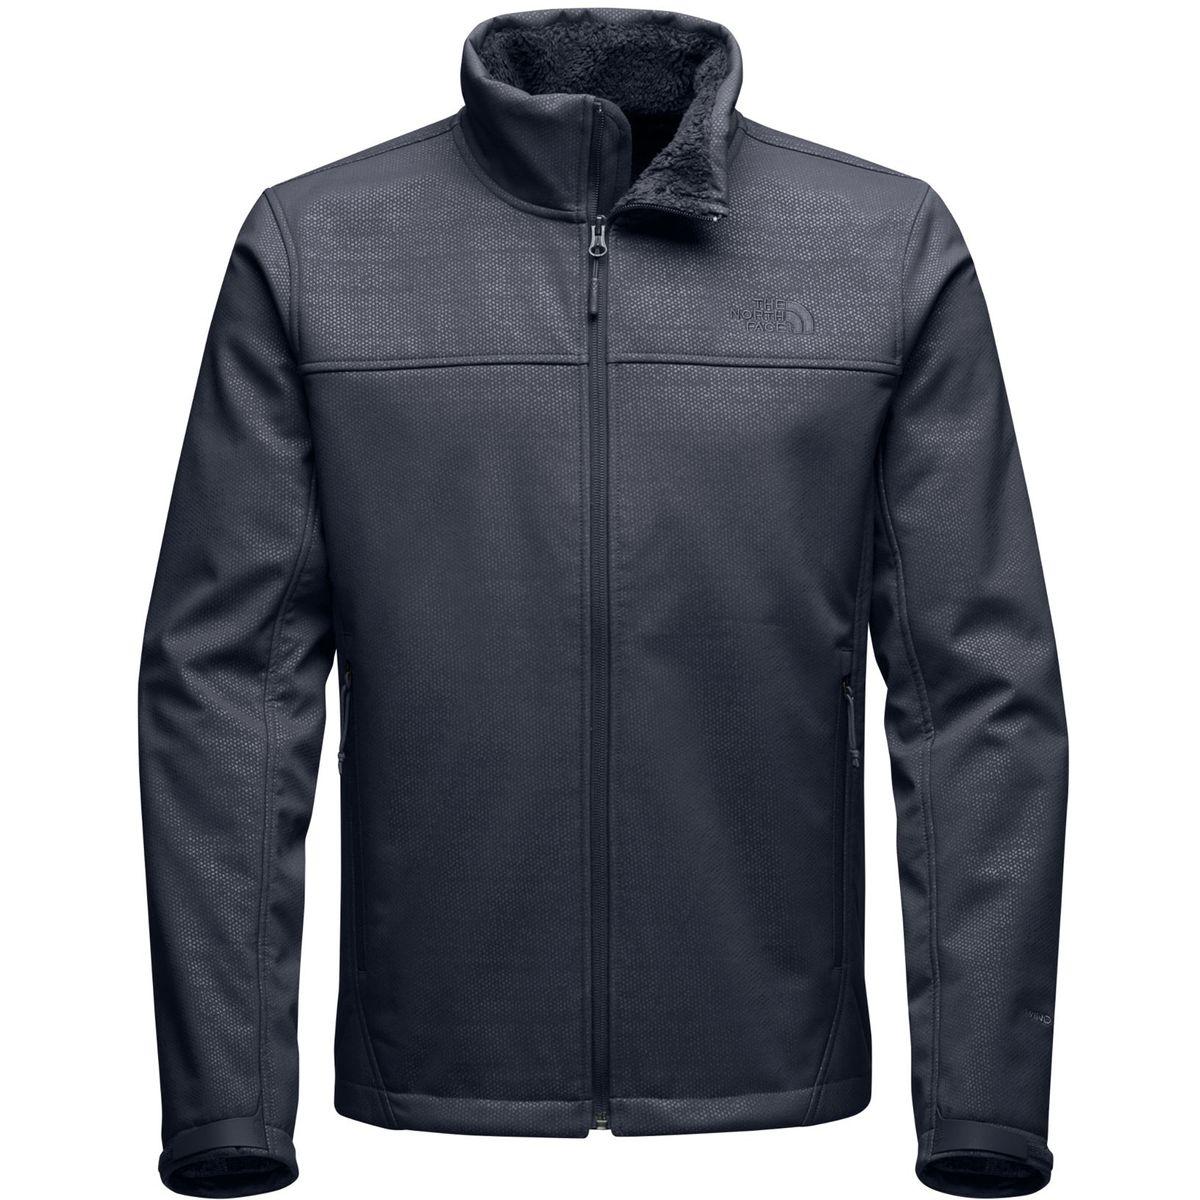 The North Face Apex Chromium Thermal Jacket - Men